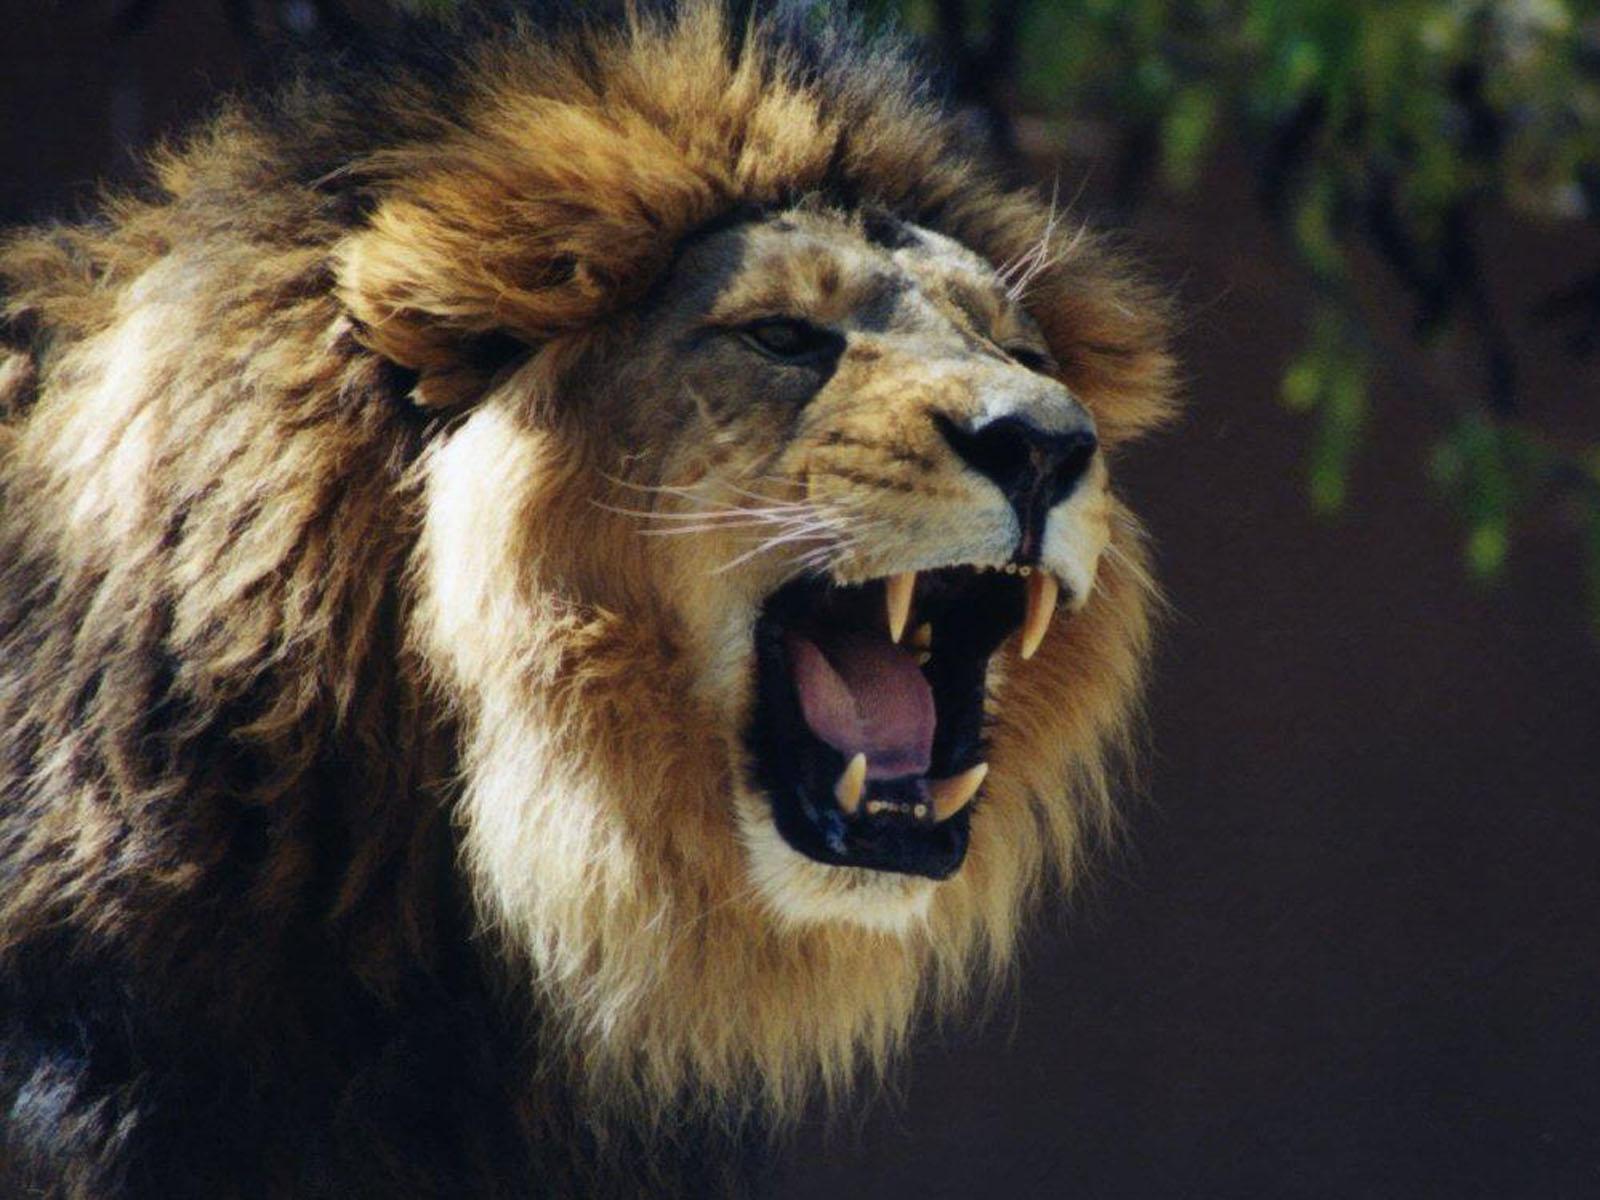 Roaring Lion Wallpaper - WallpaperSafari for Lion Roaring Gif  166kxo